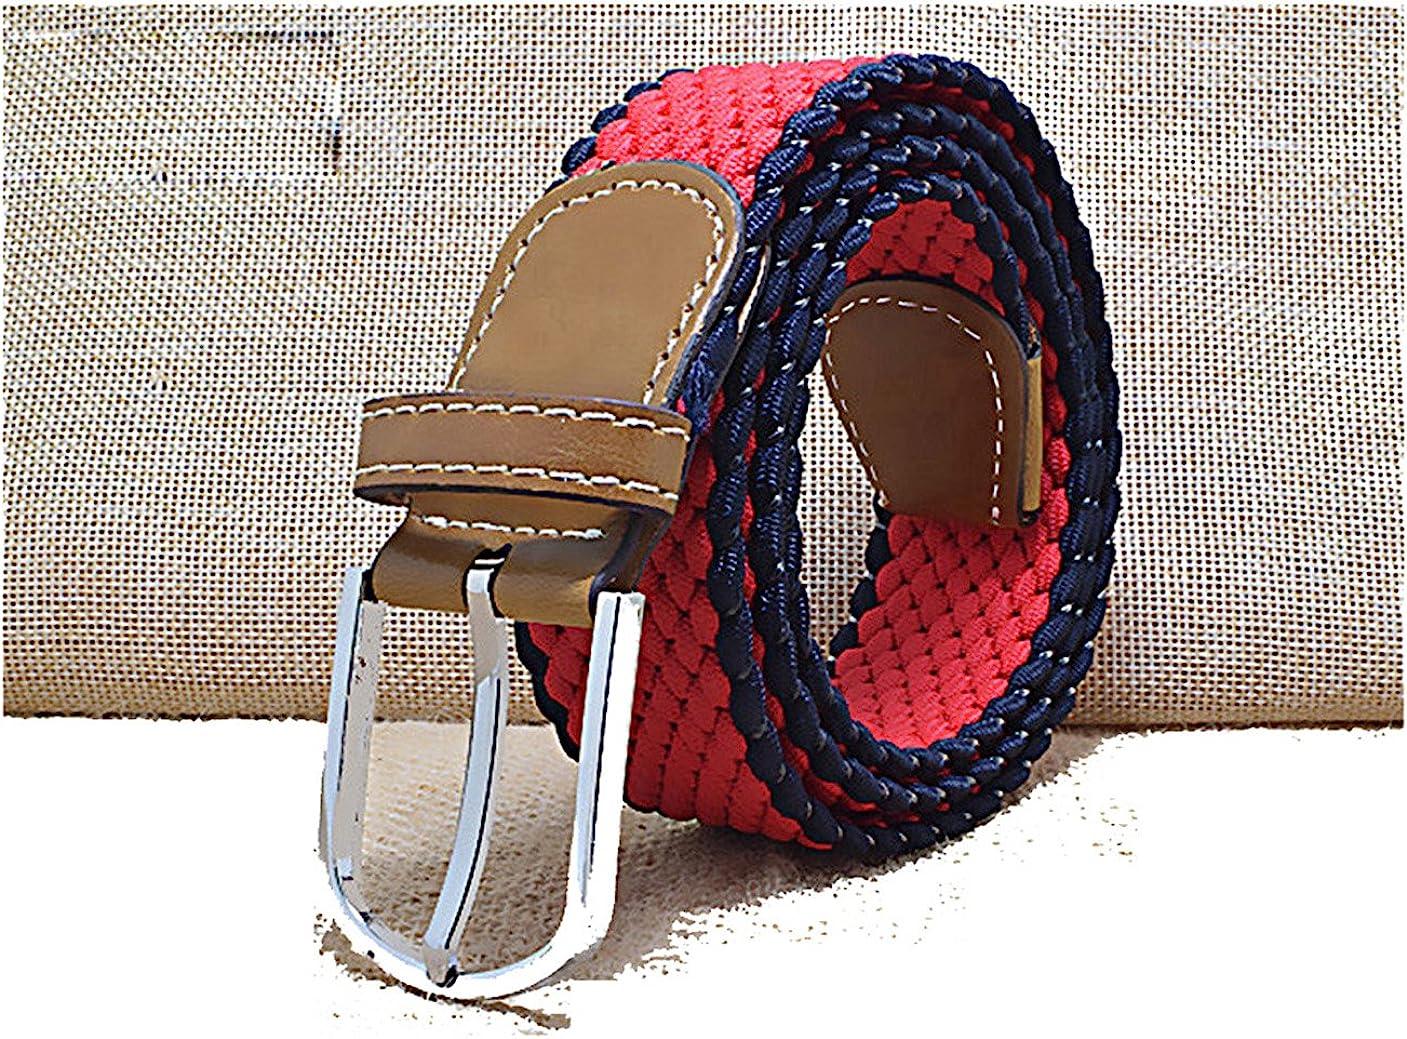 WSHINE Striped Kids Braided Adjustable Stretch Belt with Buckle Closure